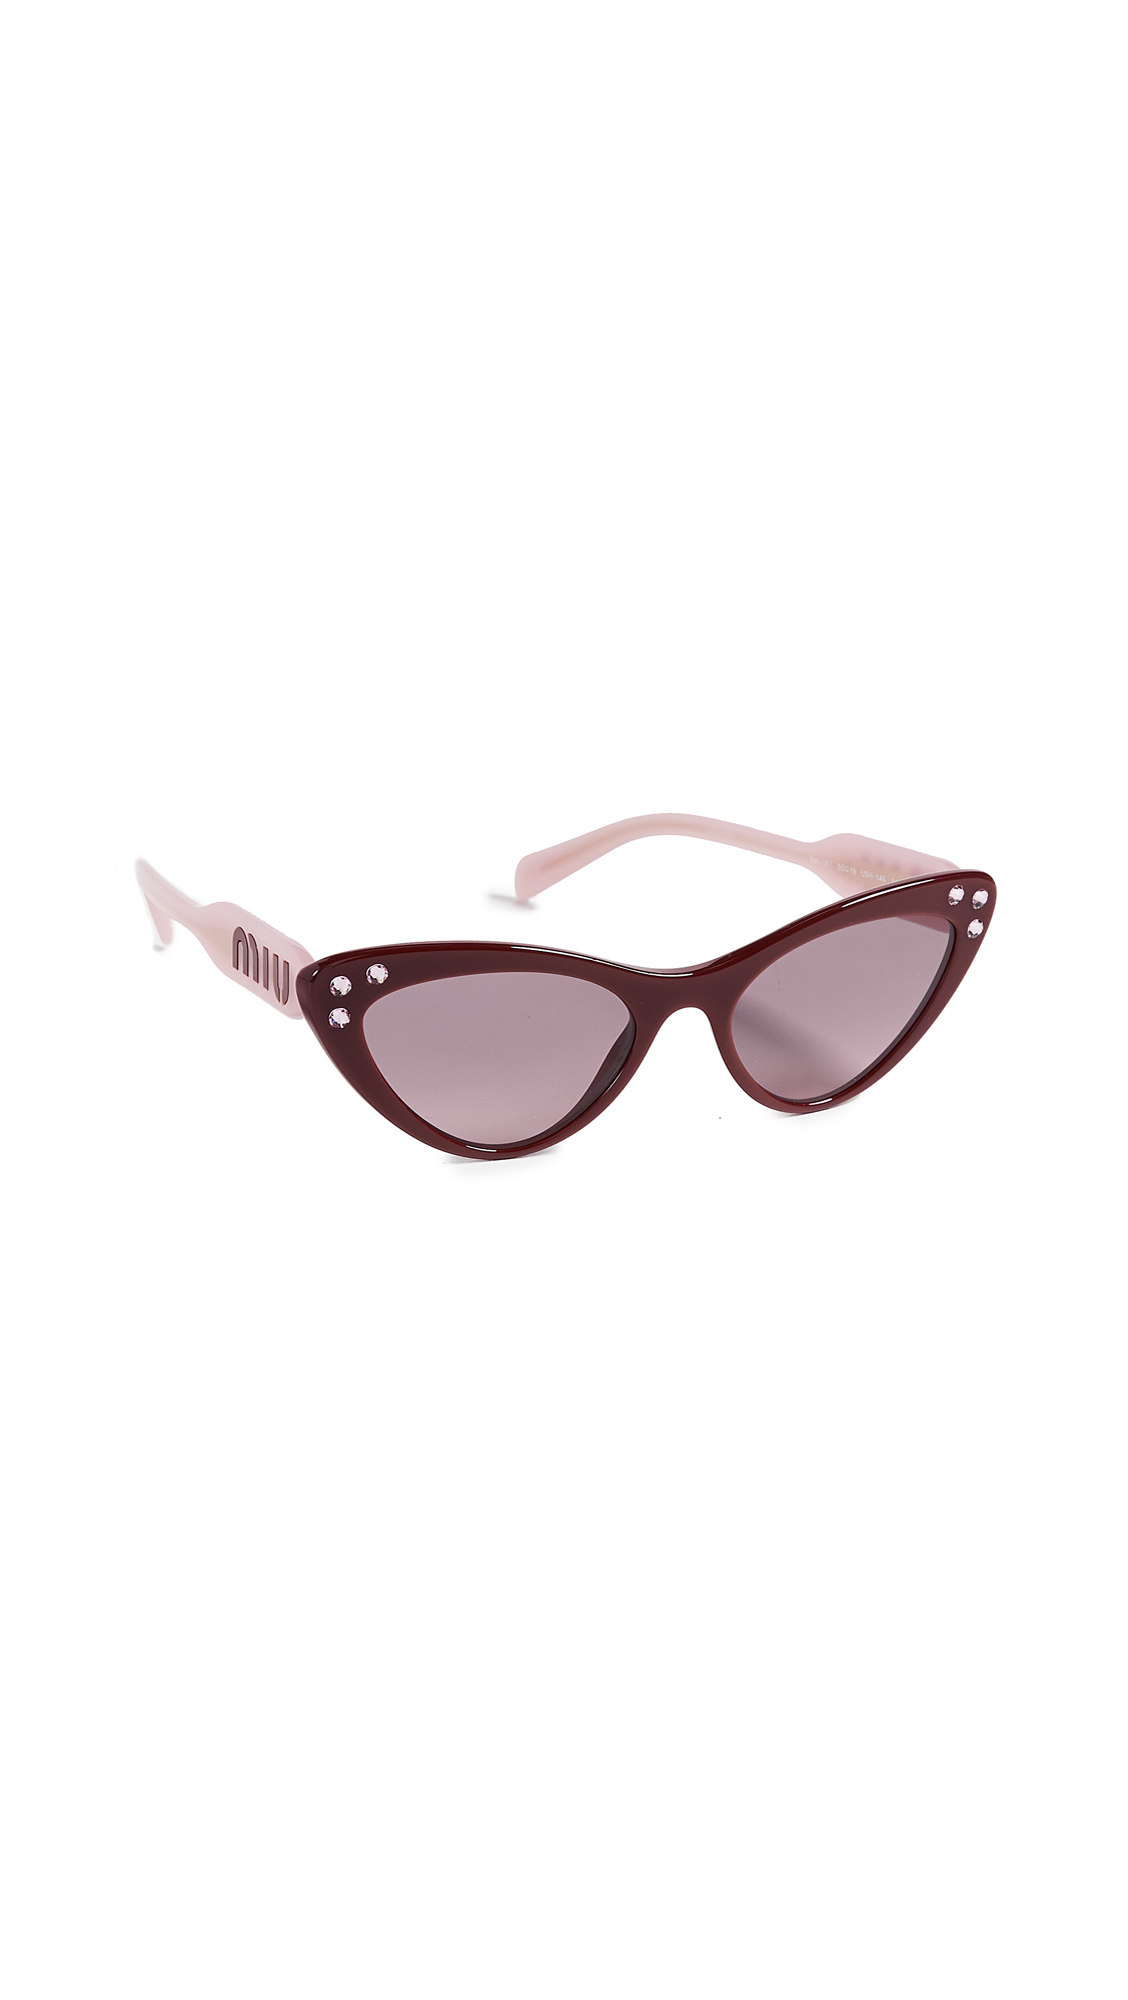 Crystals Cat Eye Sunglasses in Amaranth/Pink Gradient Grey